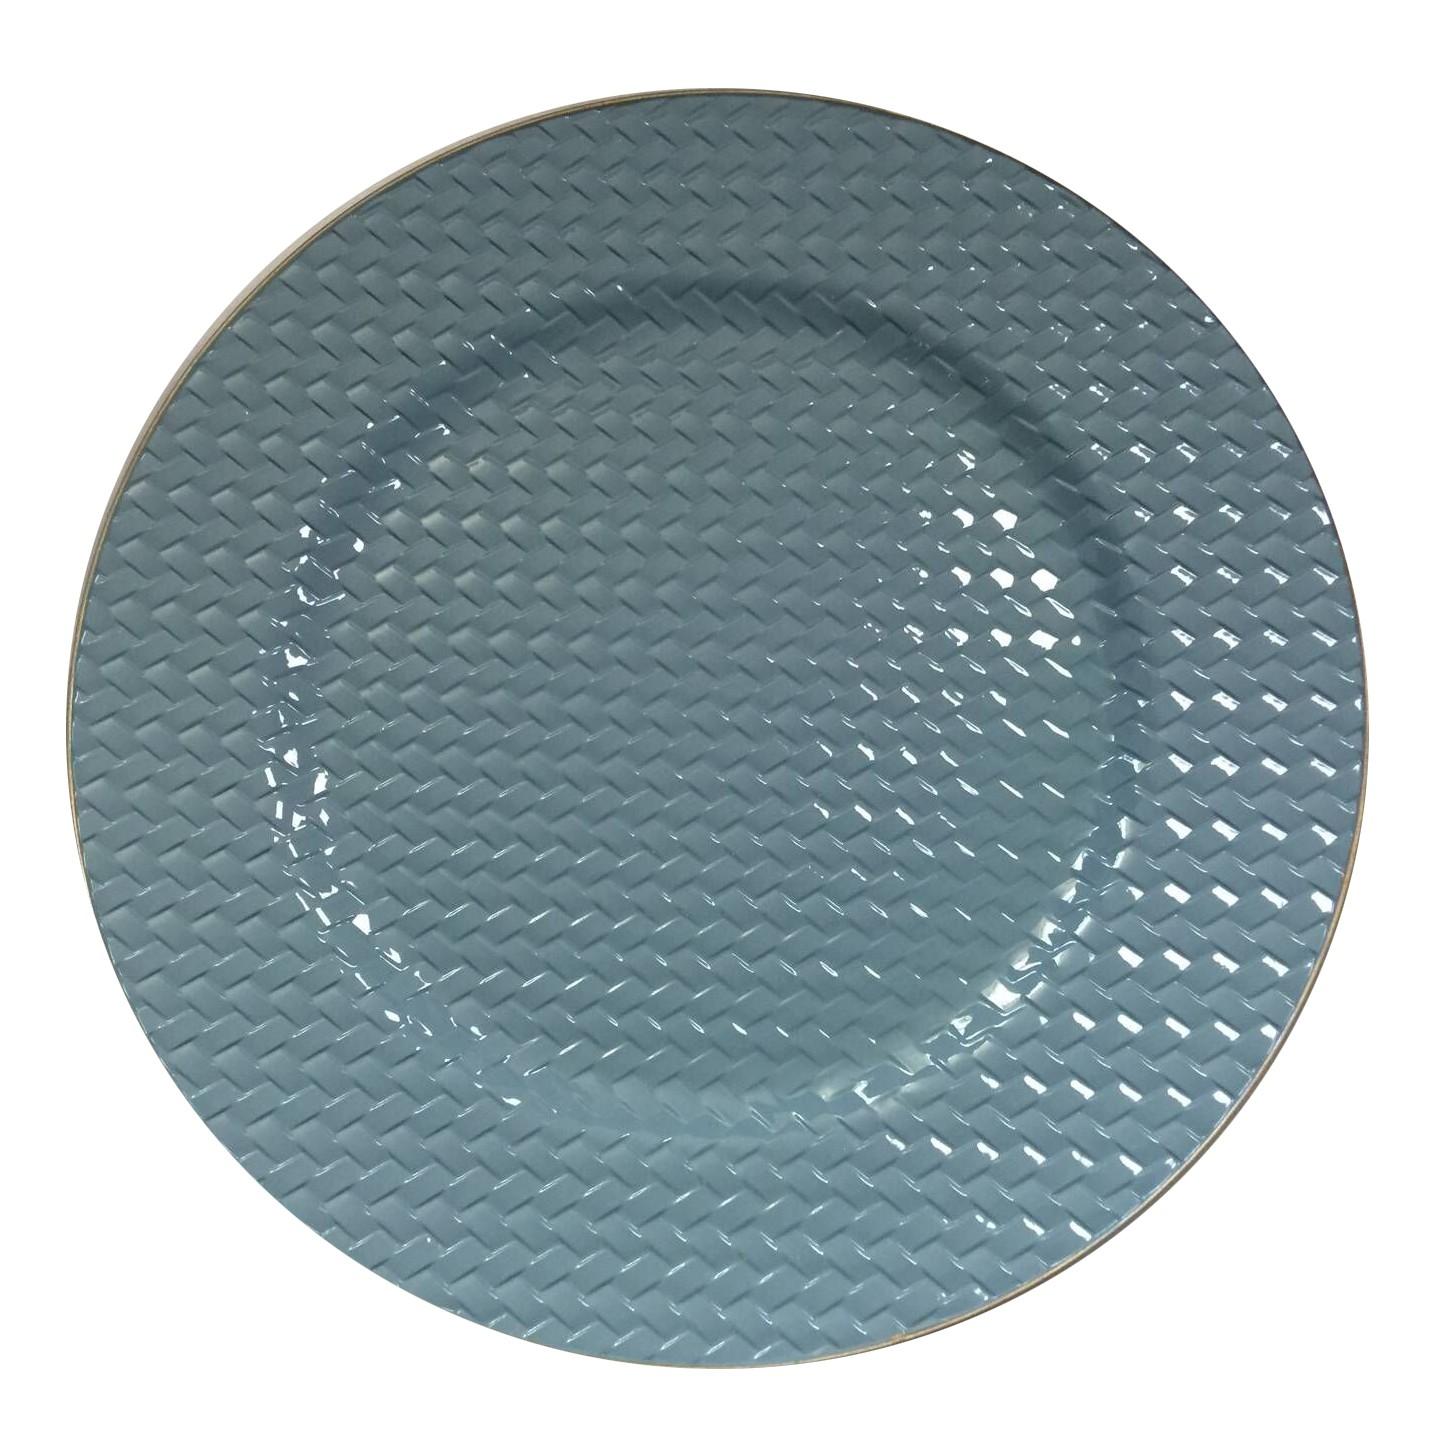 Sousplat Redondo Plastico 33cm - Full Fit